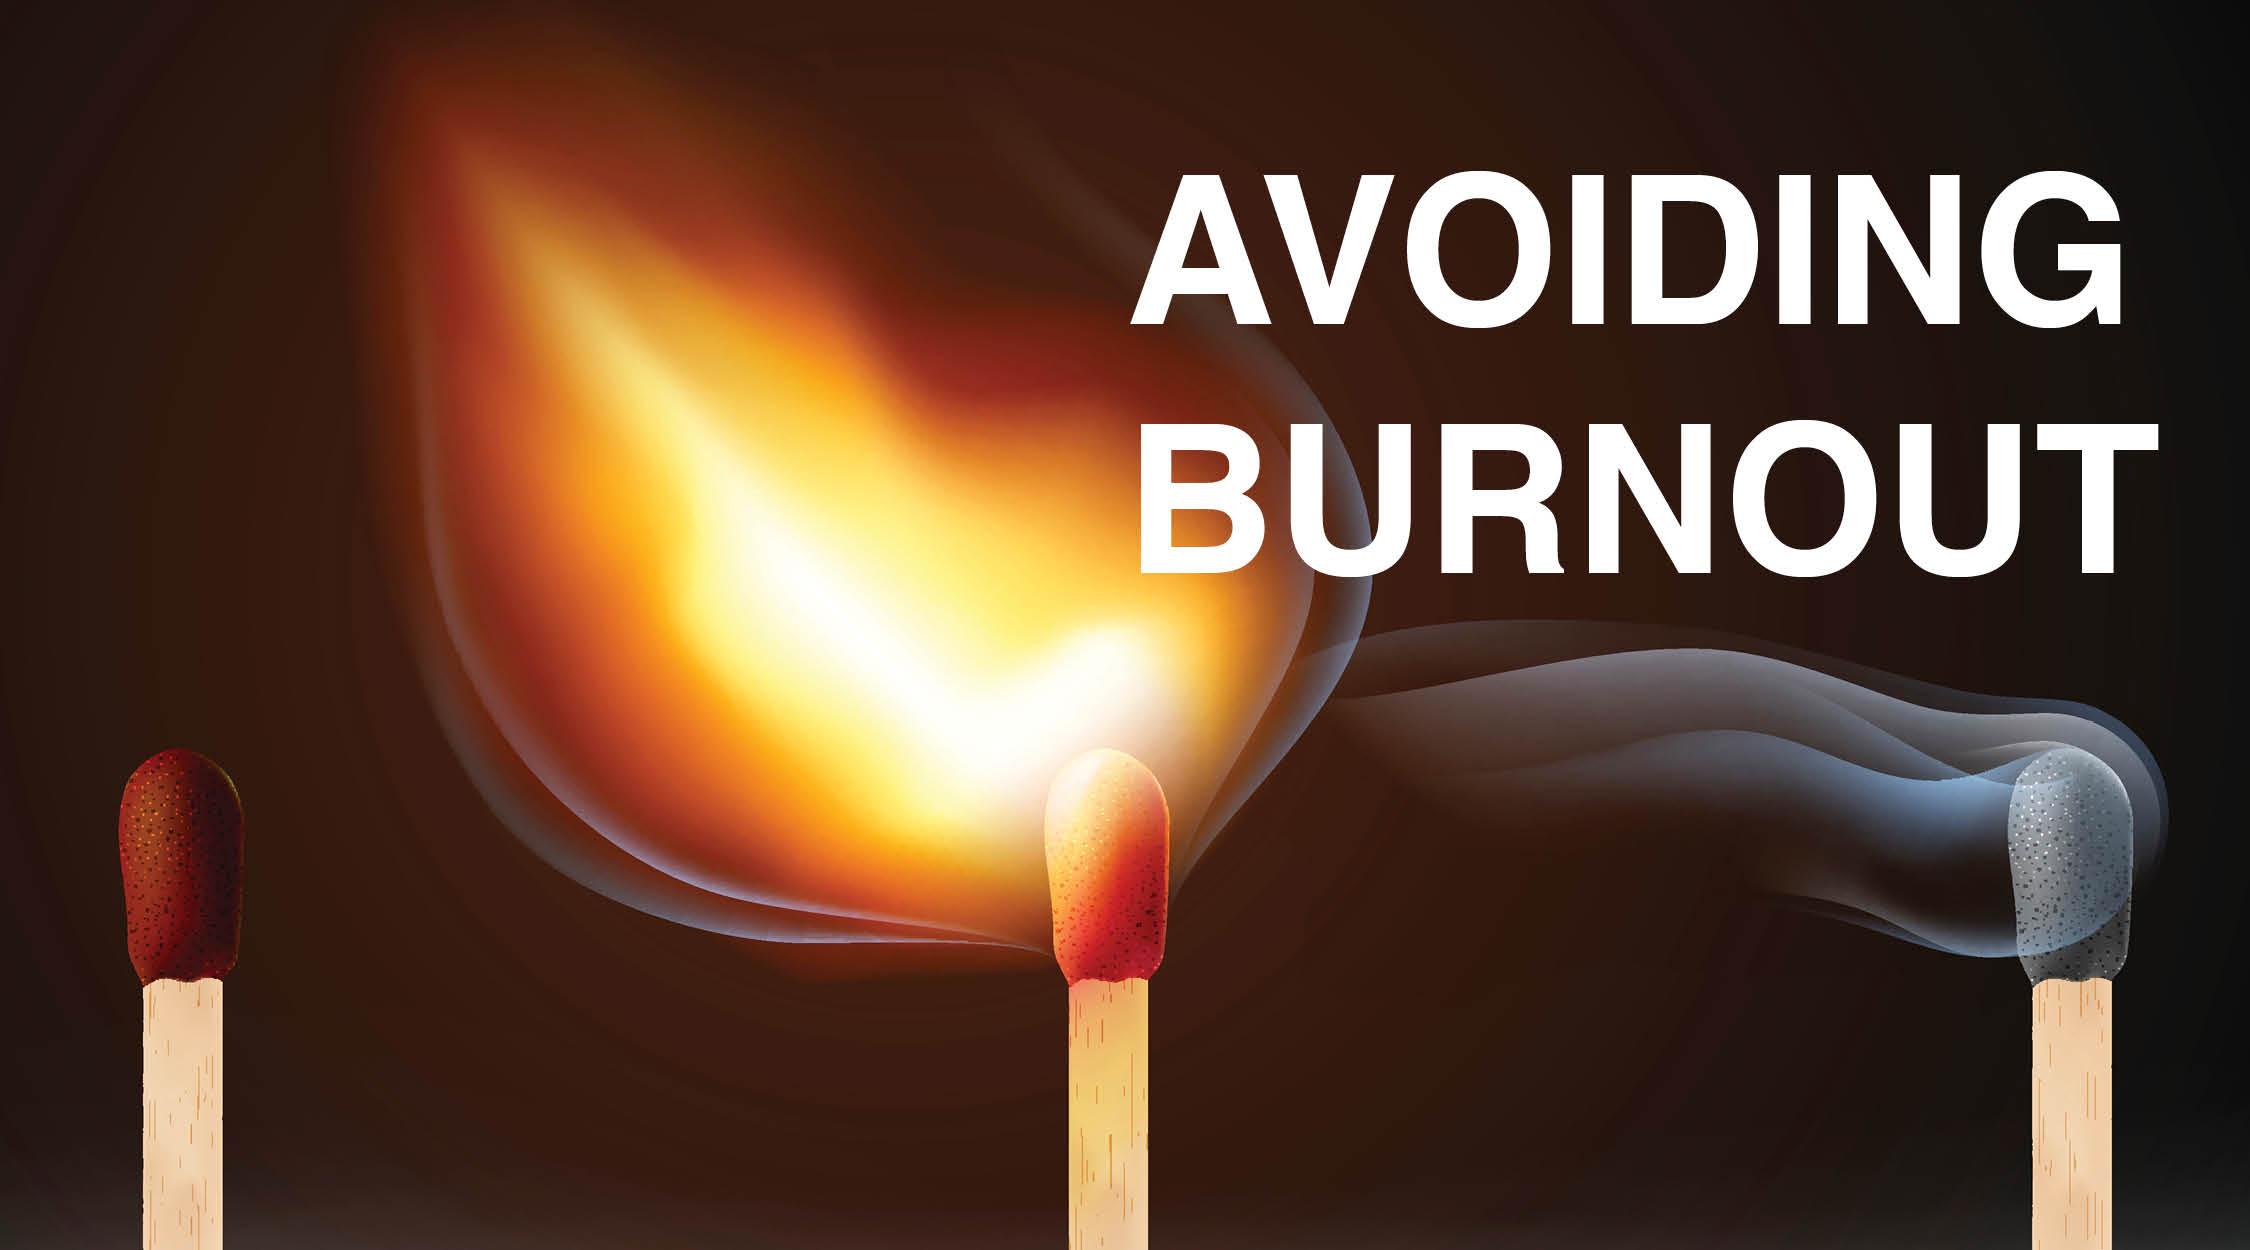 Avoiding Burnout Thru Meditation